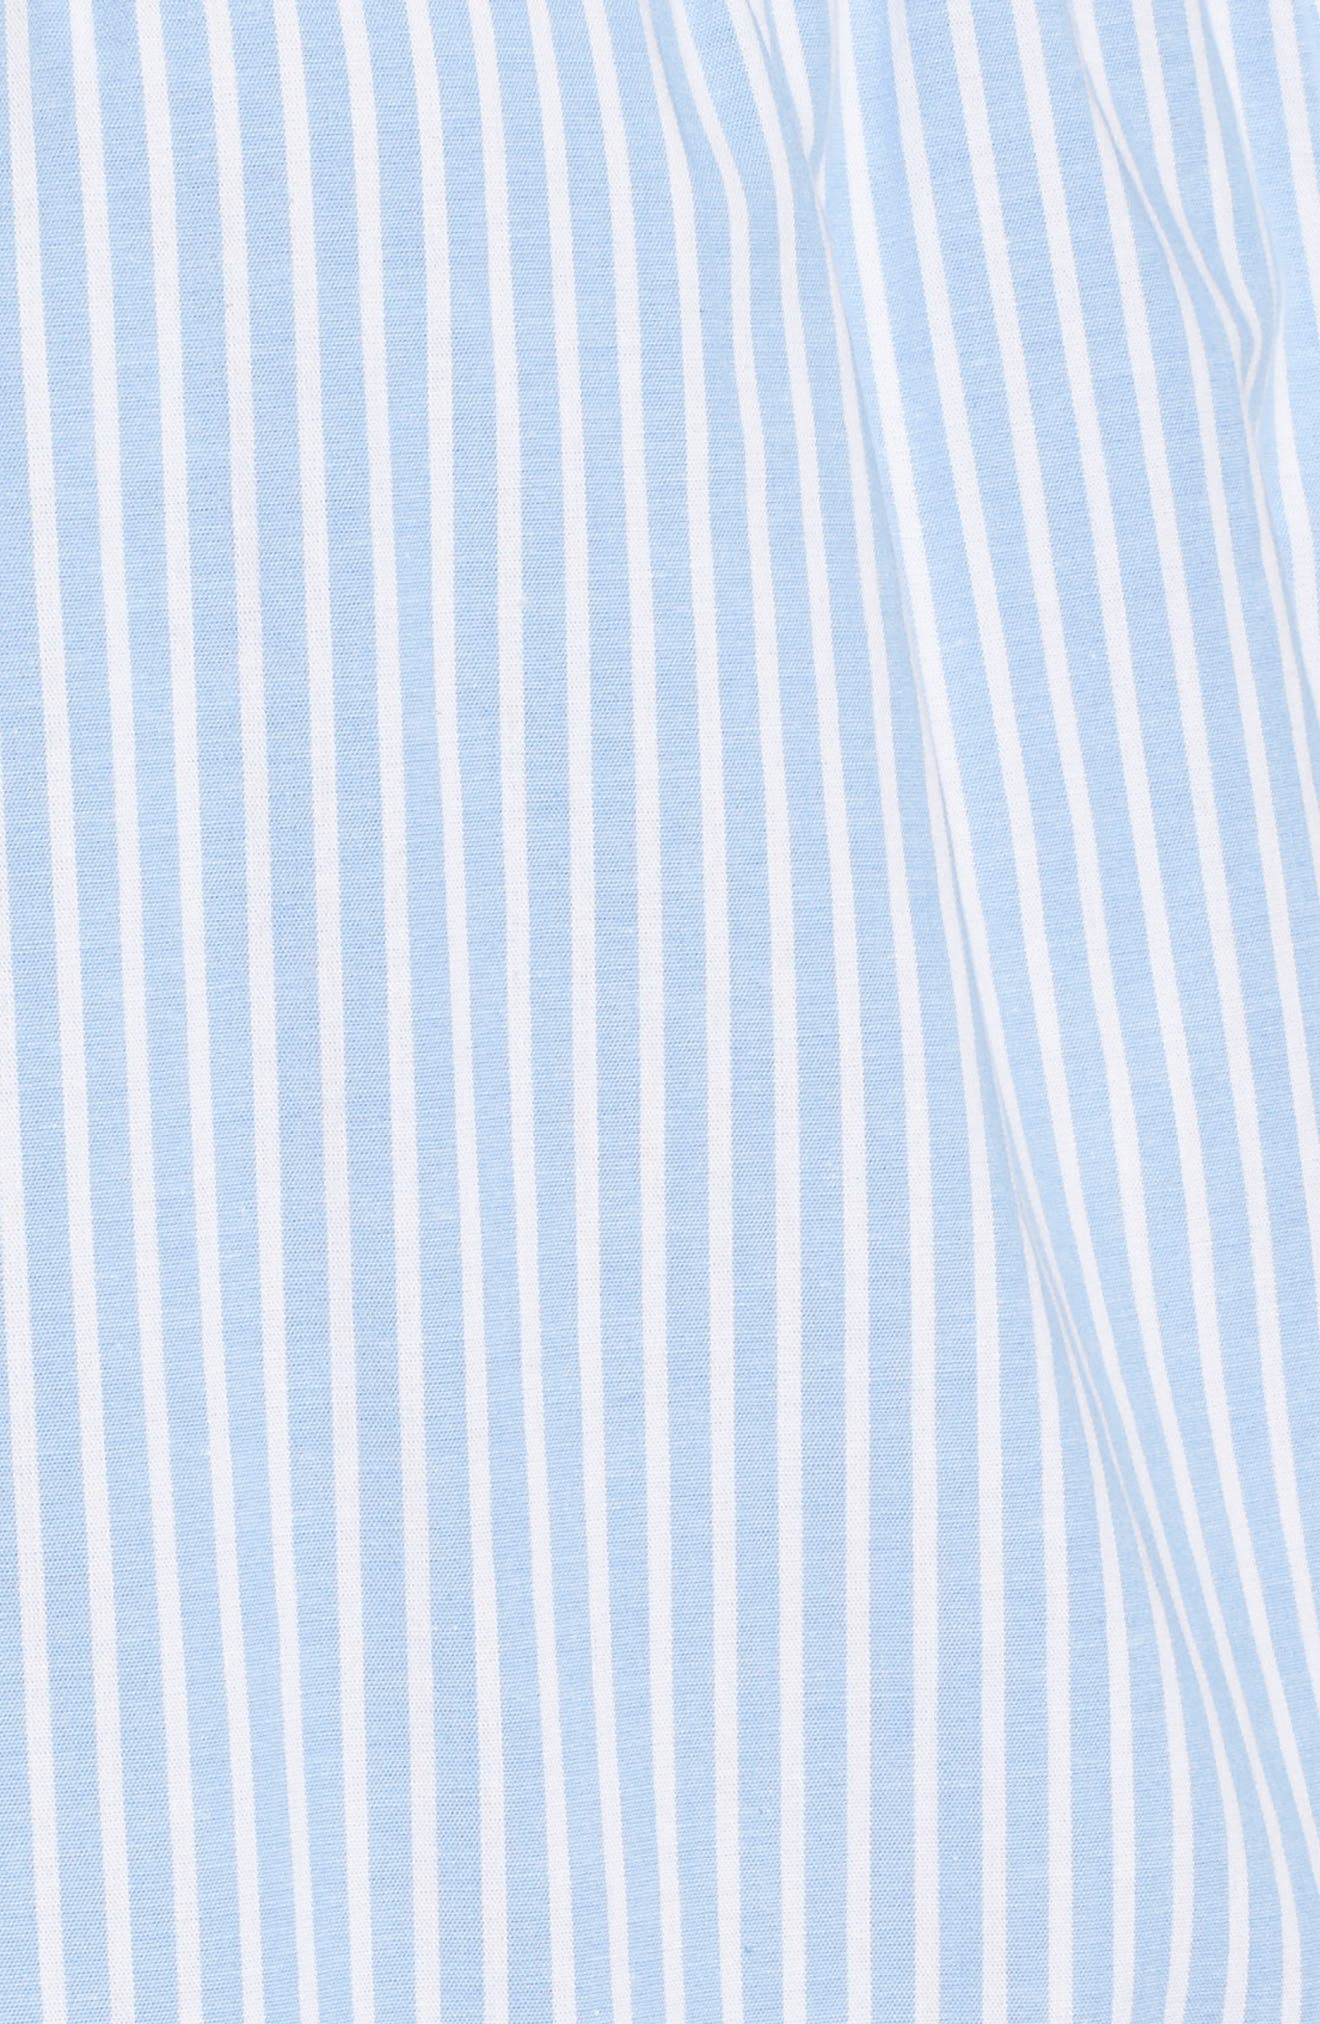 Ruffle Detail Mix Media High/Low Shirt,                             Alternate thumbnail 5, color,                             Blue- White Stripe